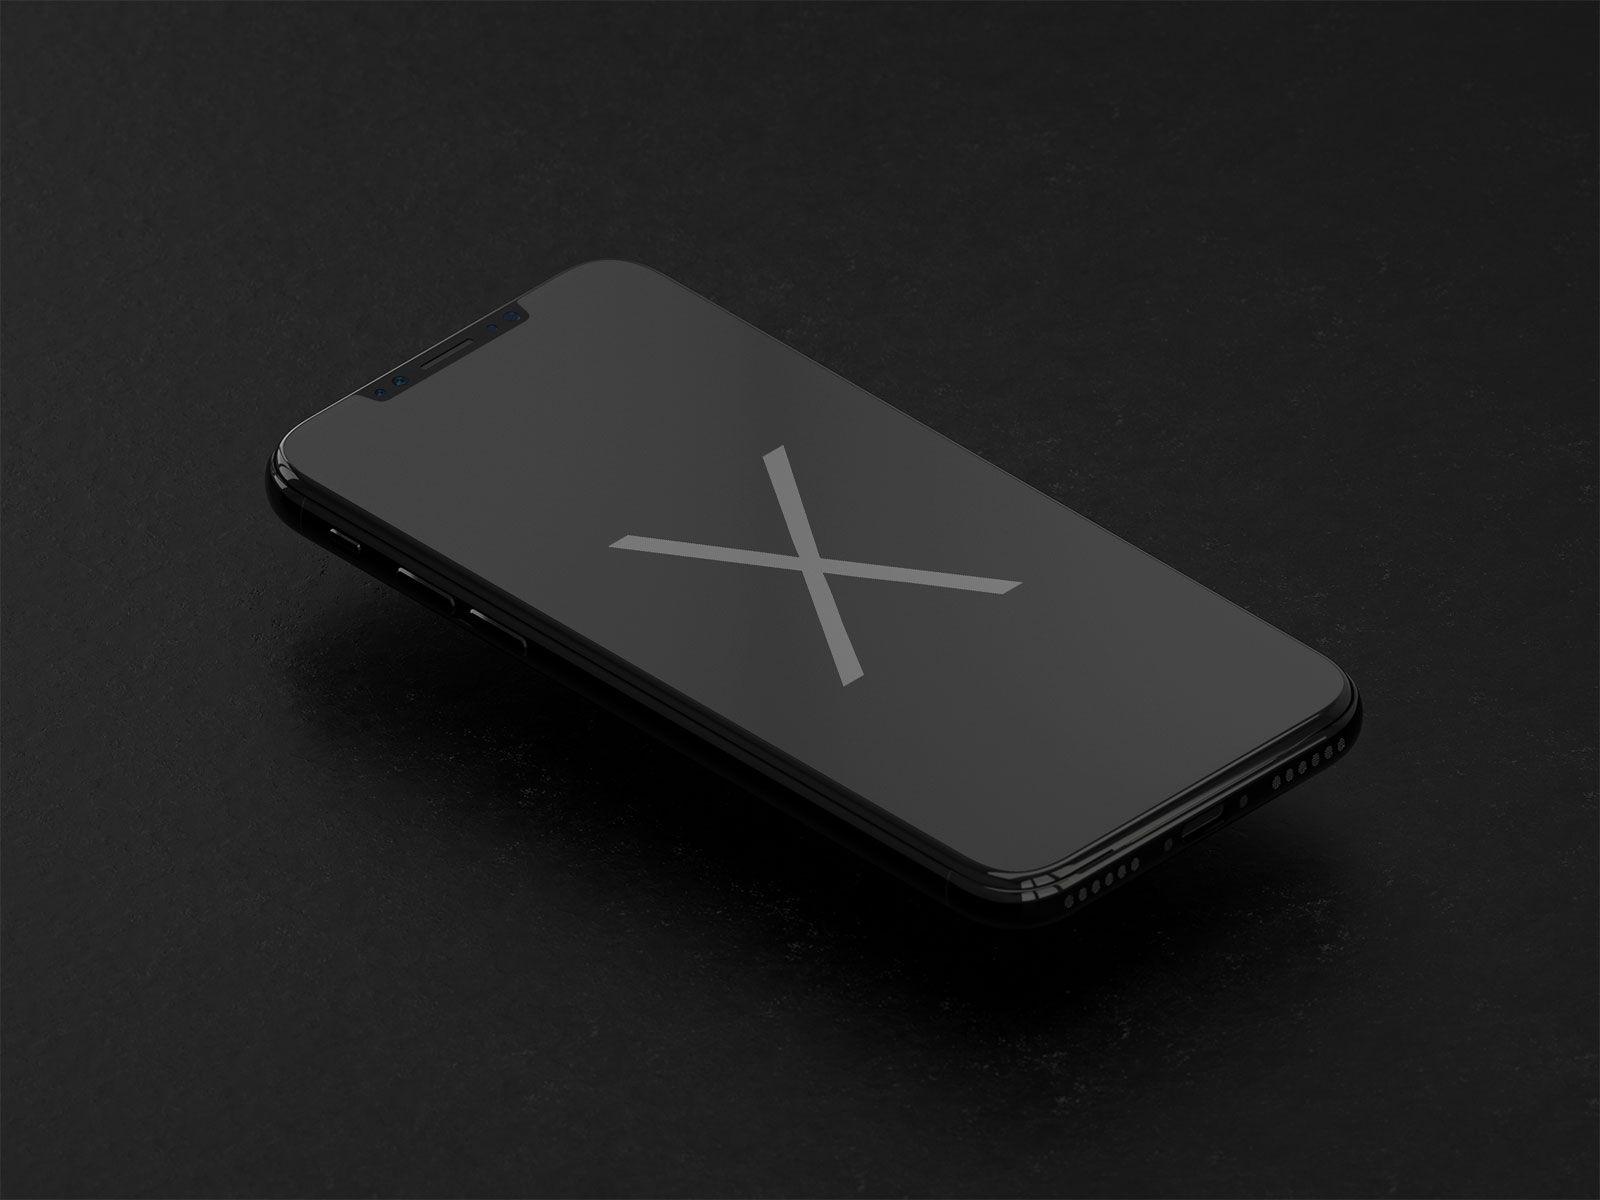 Download Free Apple Iphone X Black Mockup Psd Apple Iphone Iphone Gold Iphone Case